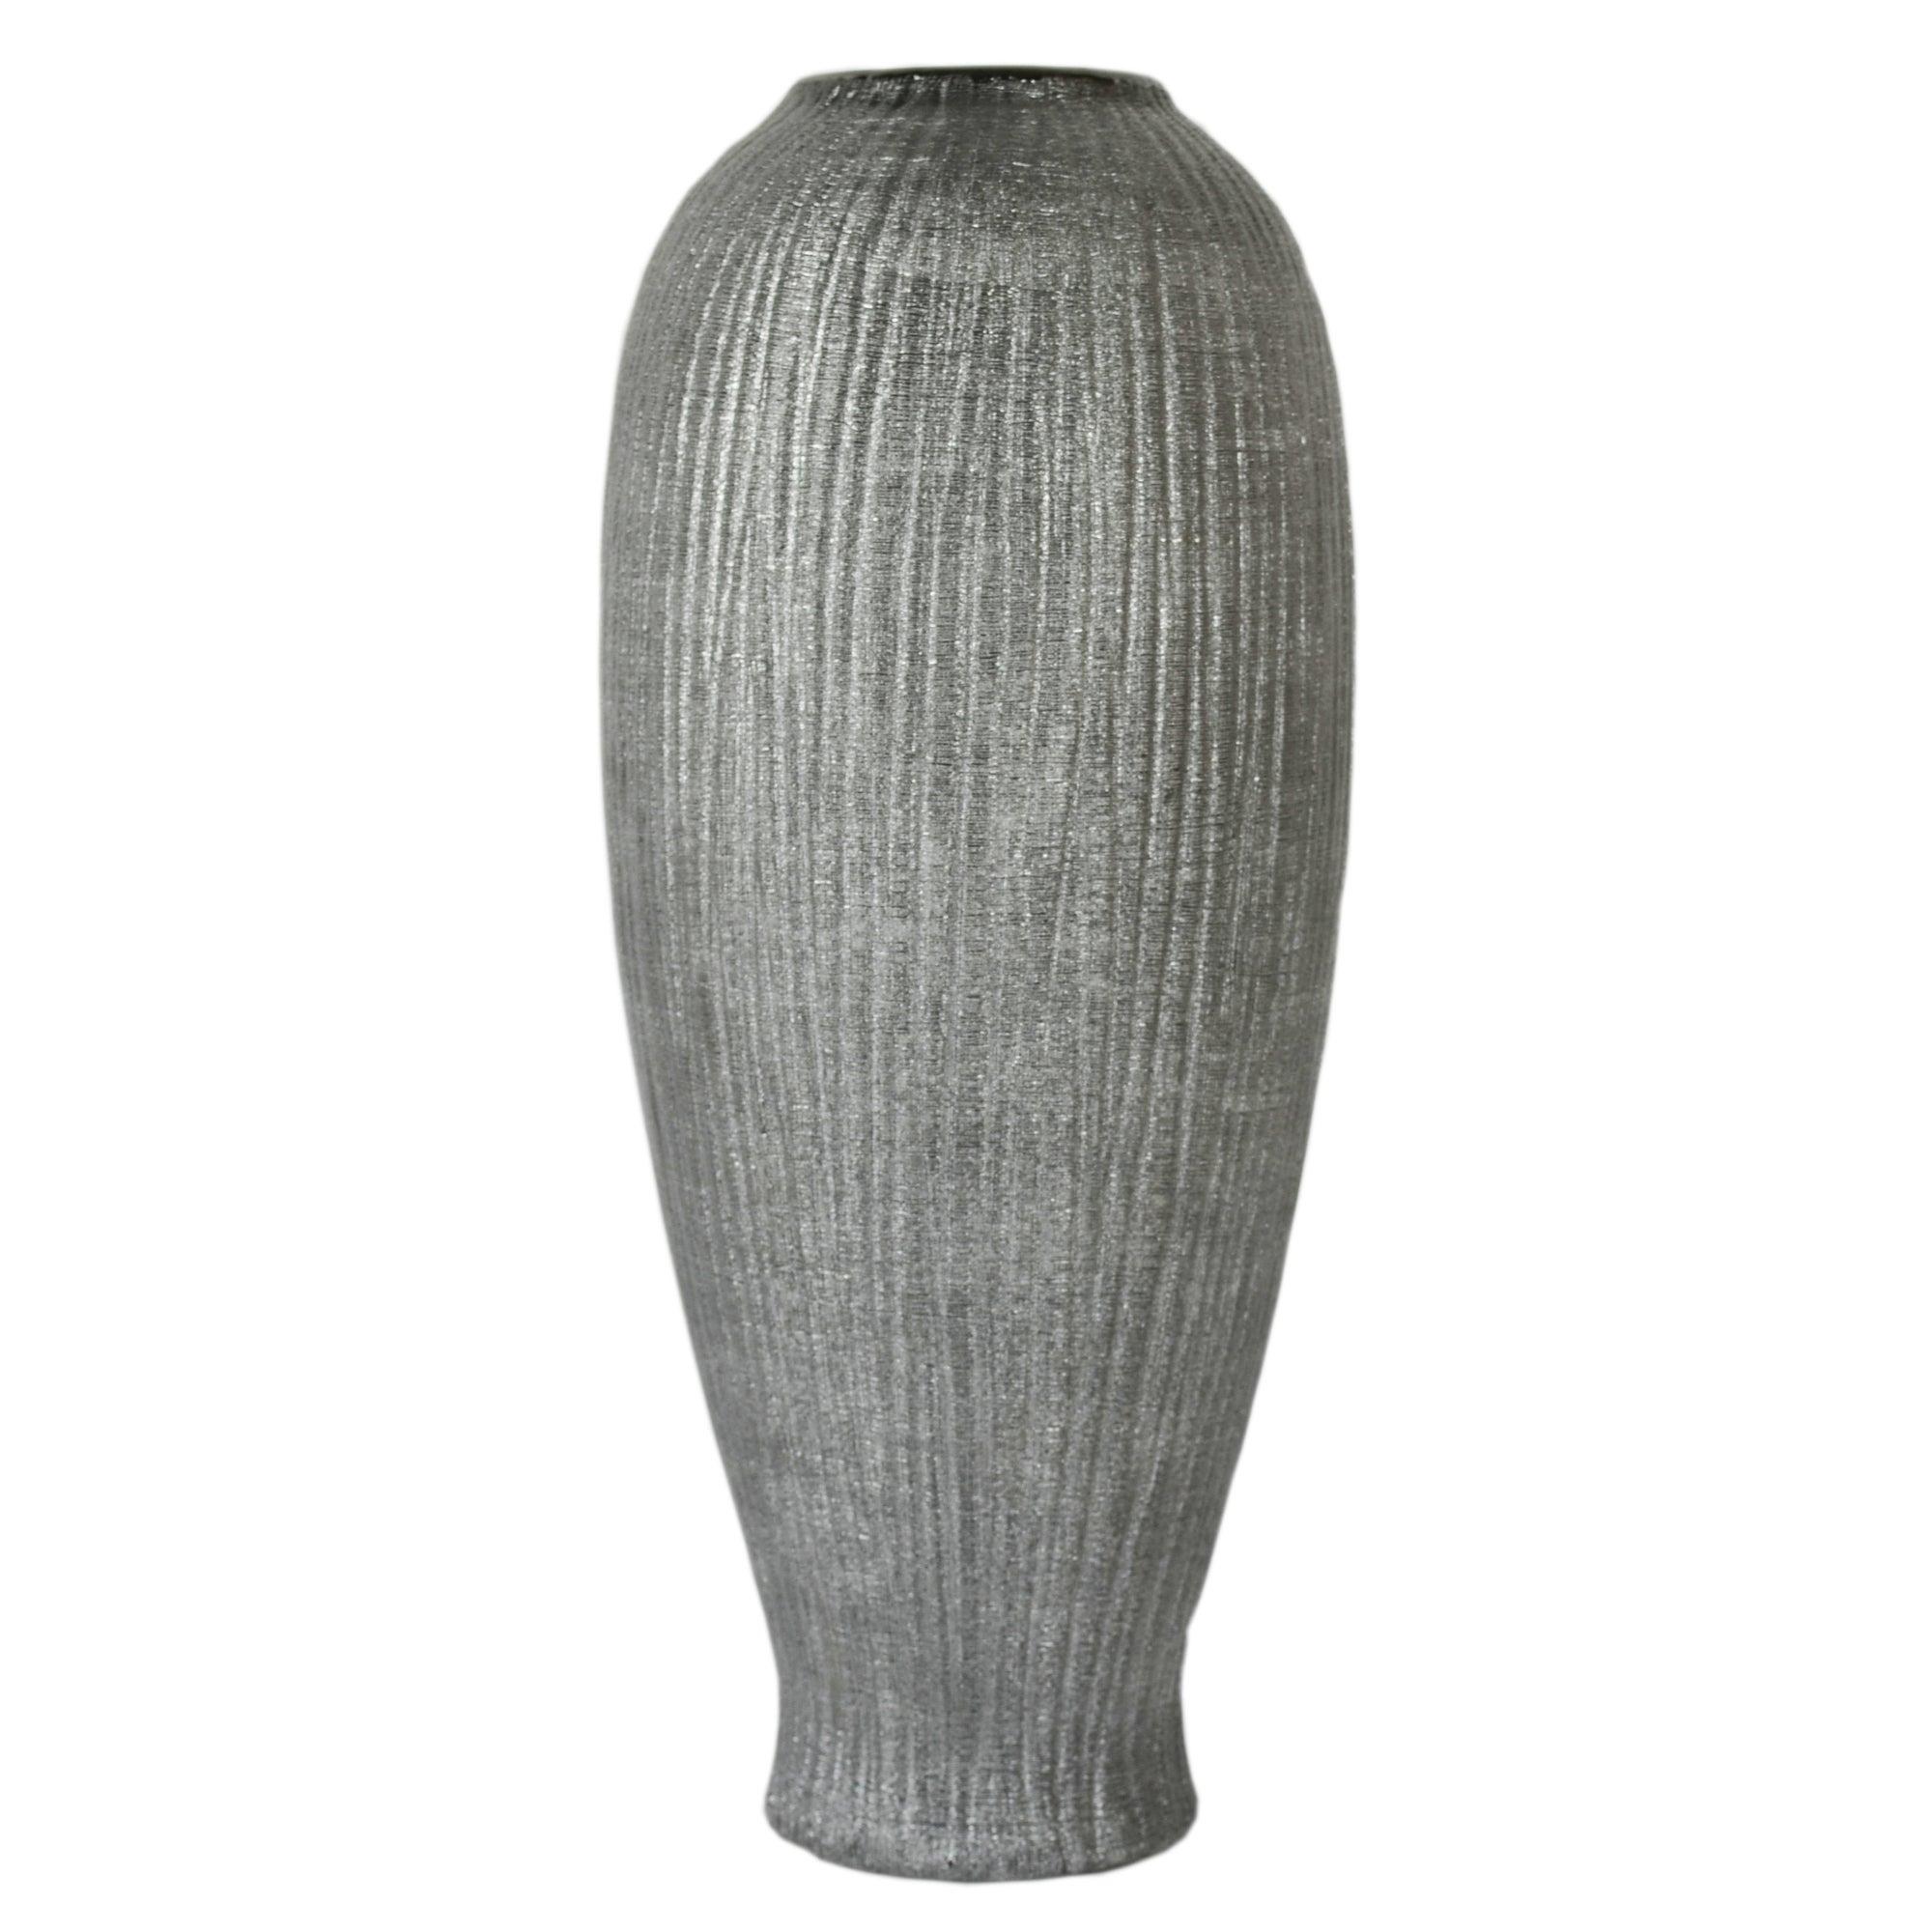 Photo of New naturals ridged vase grey / silver